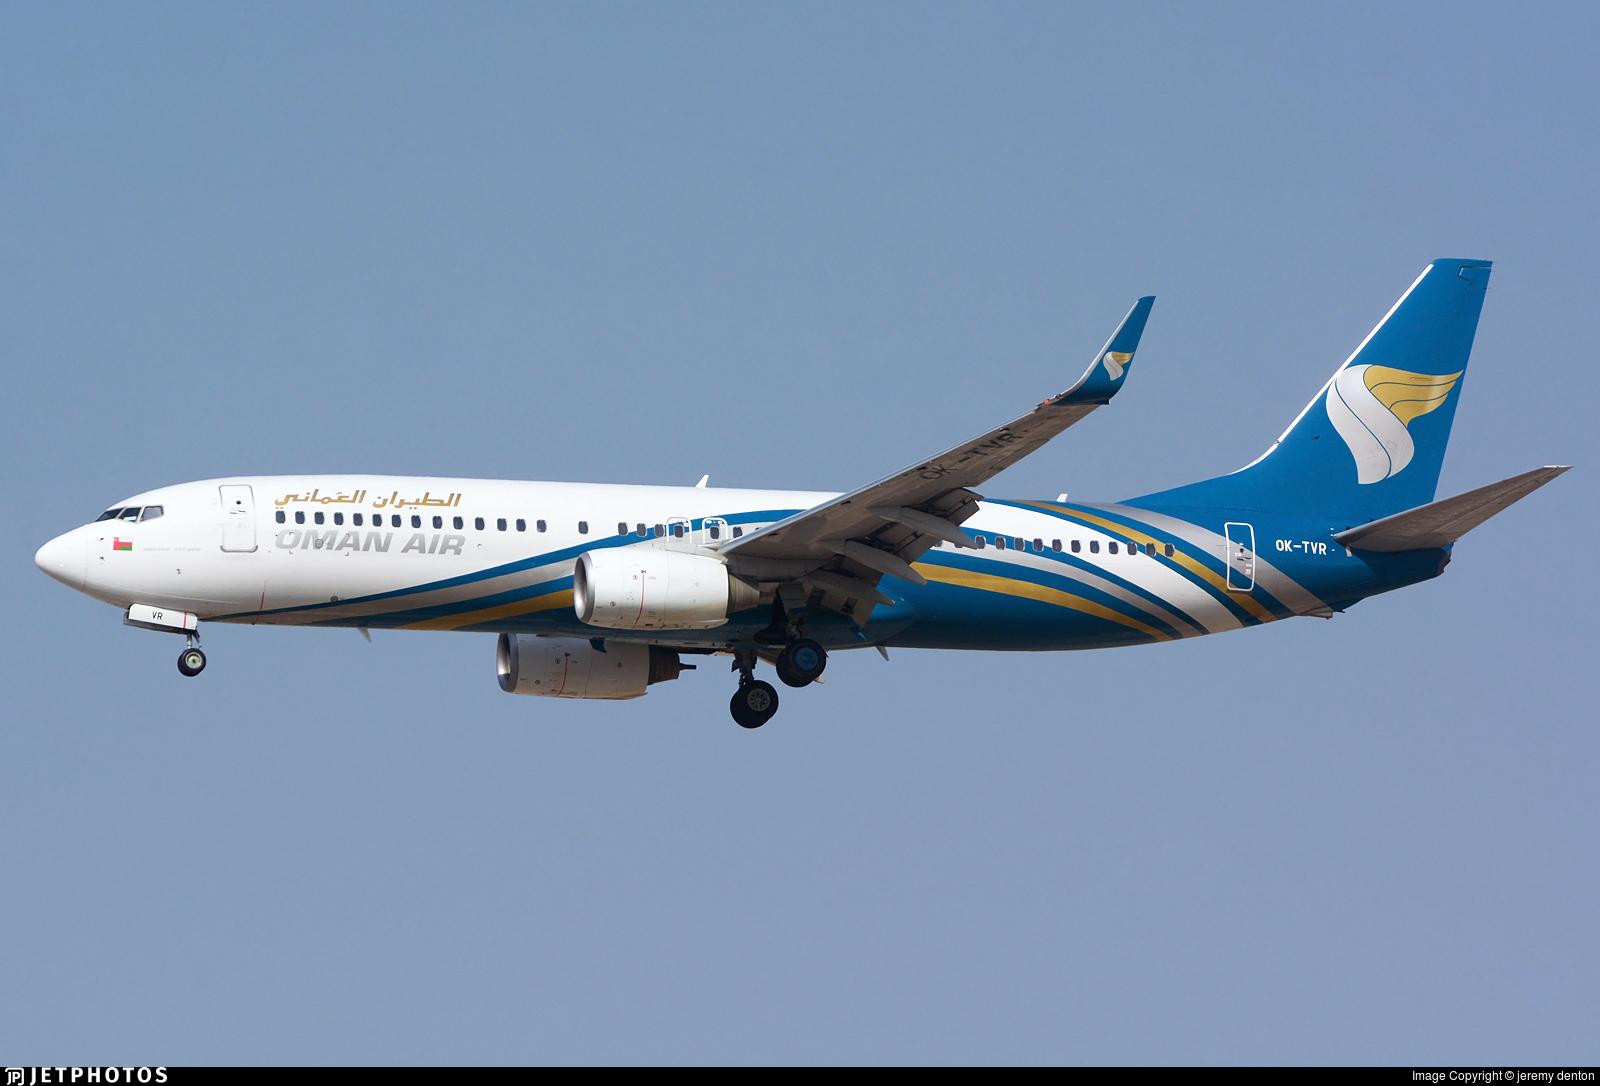 OK-TVR - Boeing 737-86N - Oman Air (Travel Service)